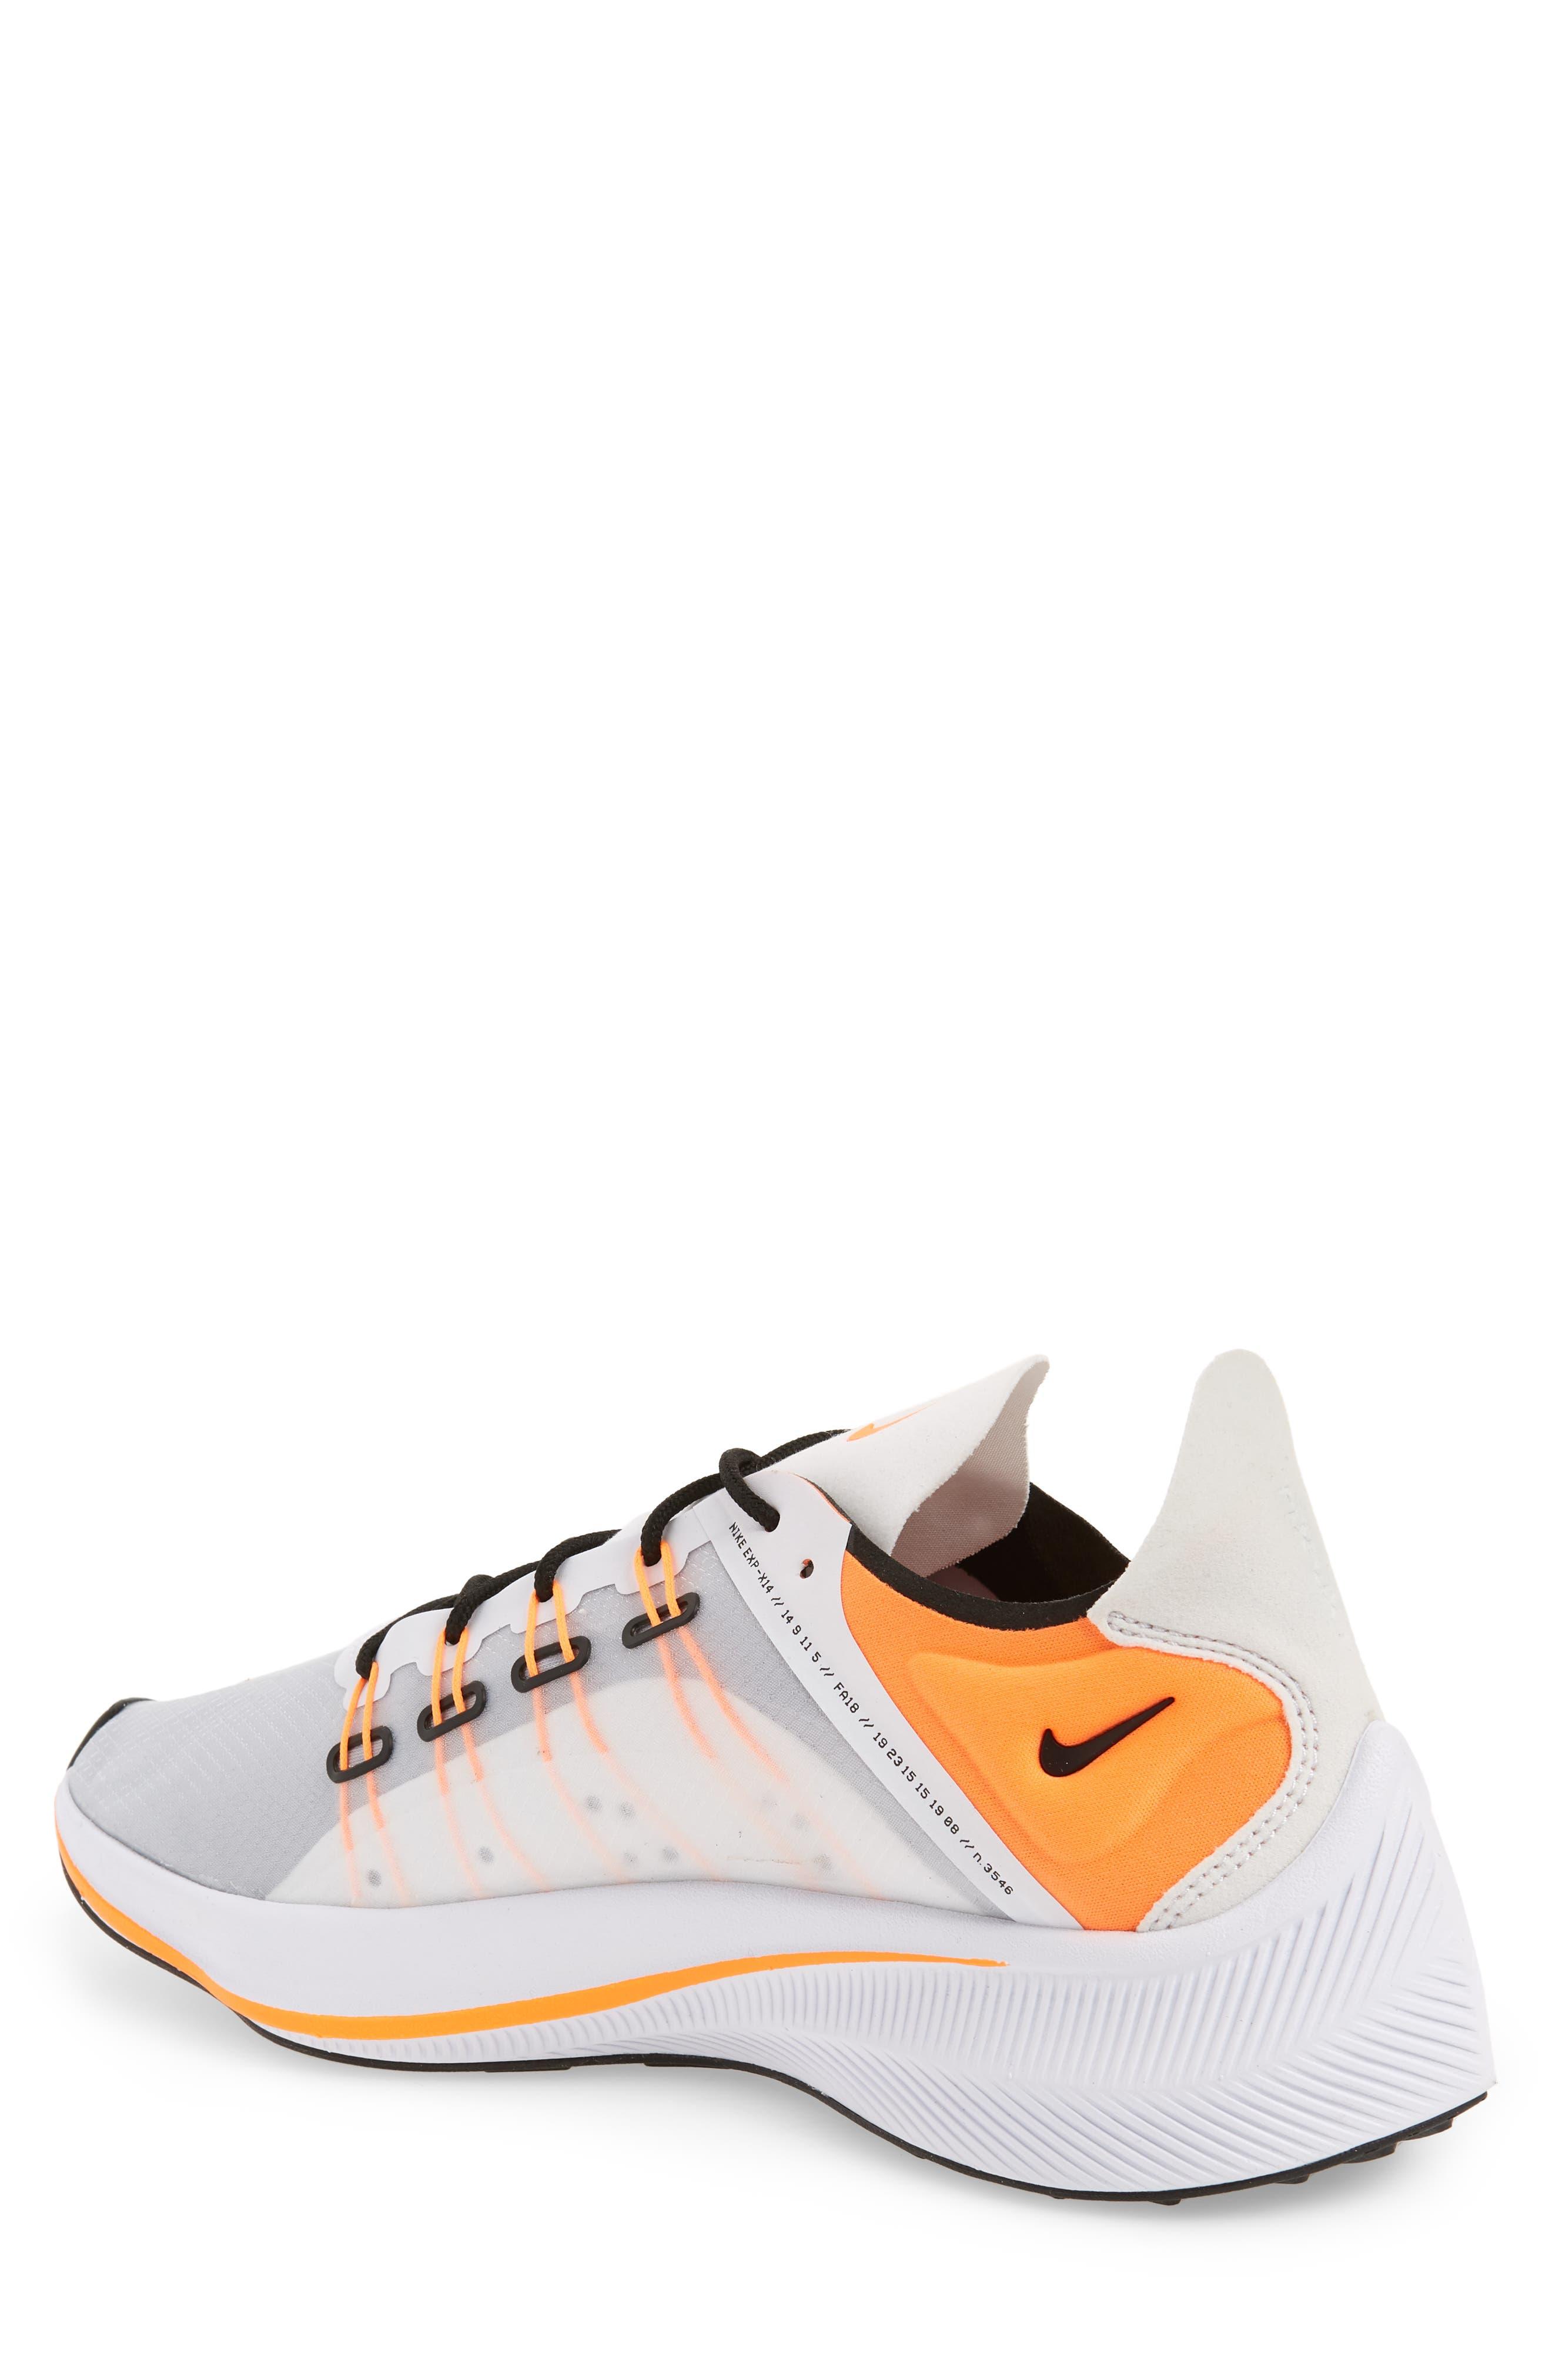 EXP-X14 Just Do It Sneaker,                             Alternate thumbnail 2, color,                             100